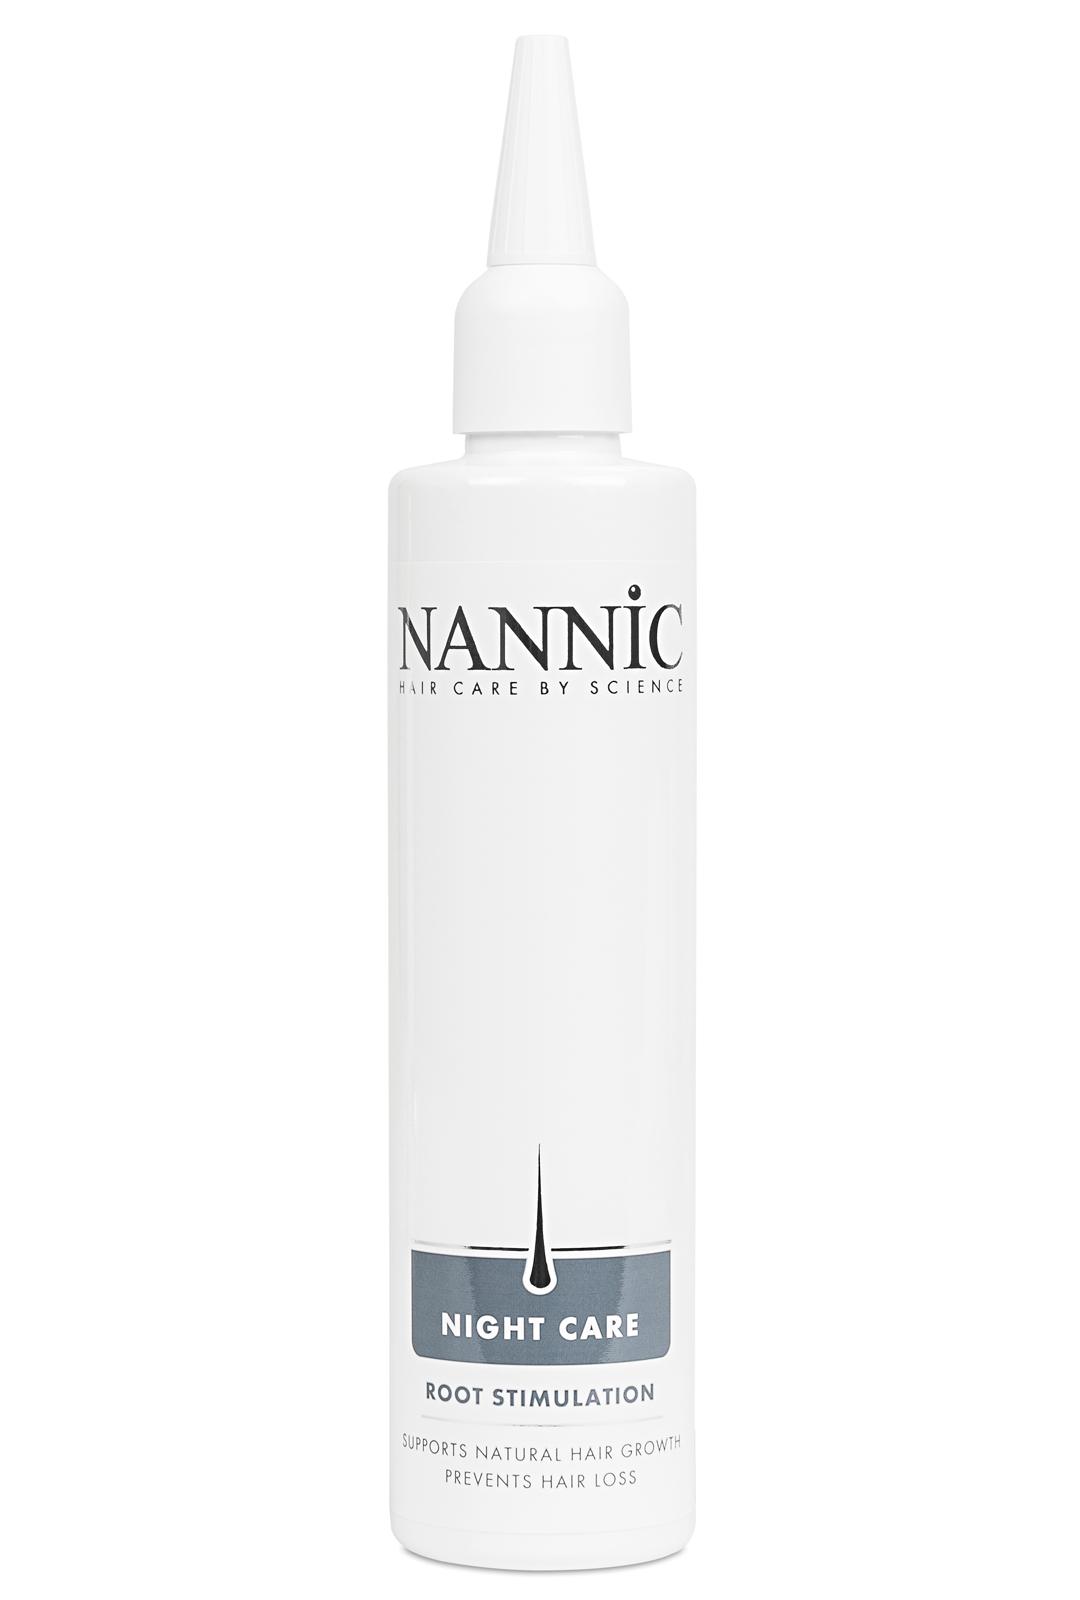 Nannic Follicle Rejuvenation Day Care Lotion